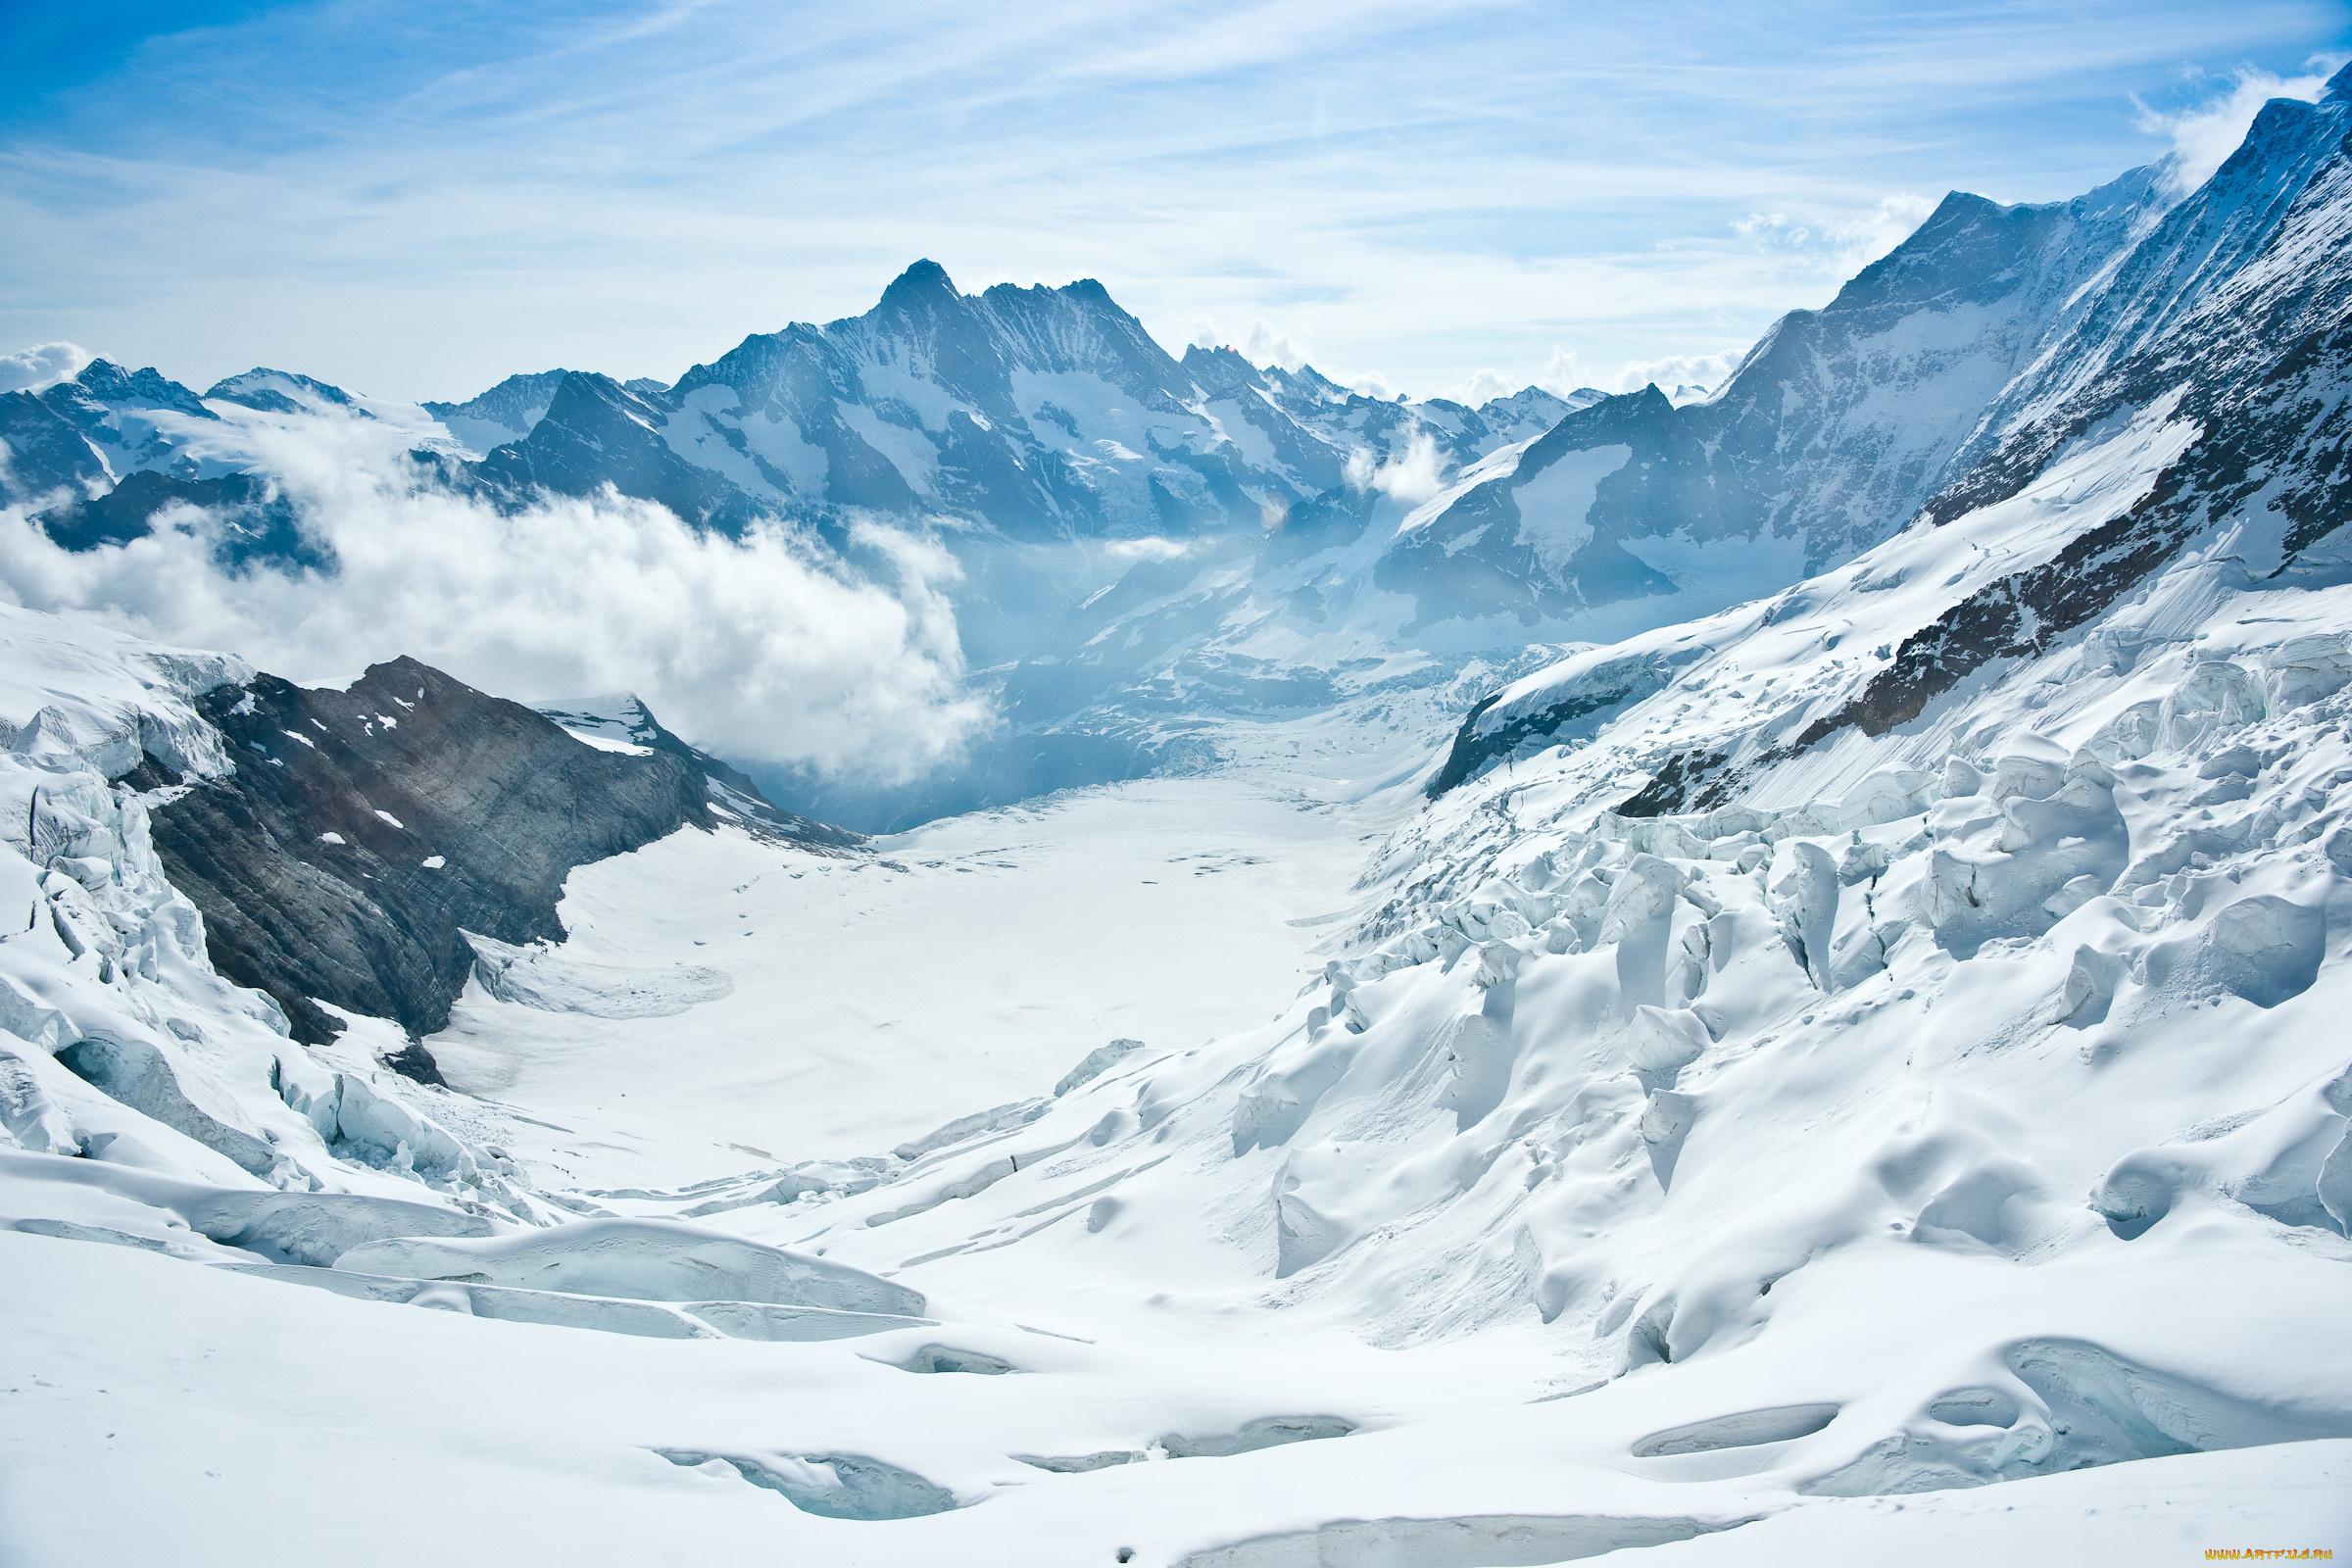 снег ели гора snow ate mountain  № 2479190 без смс